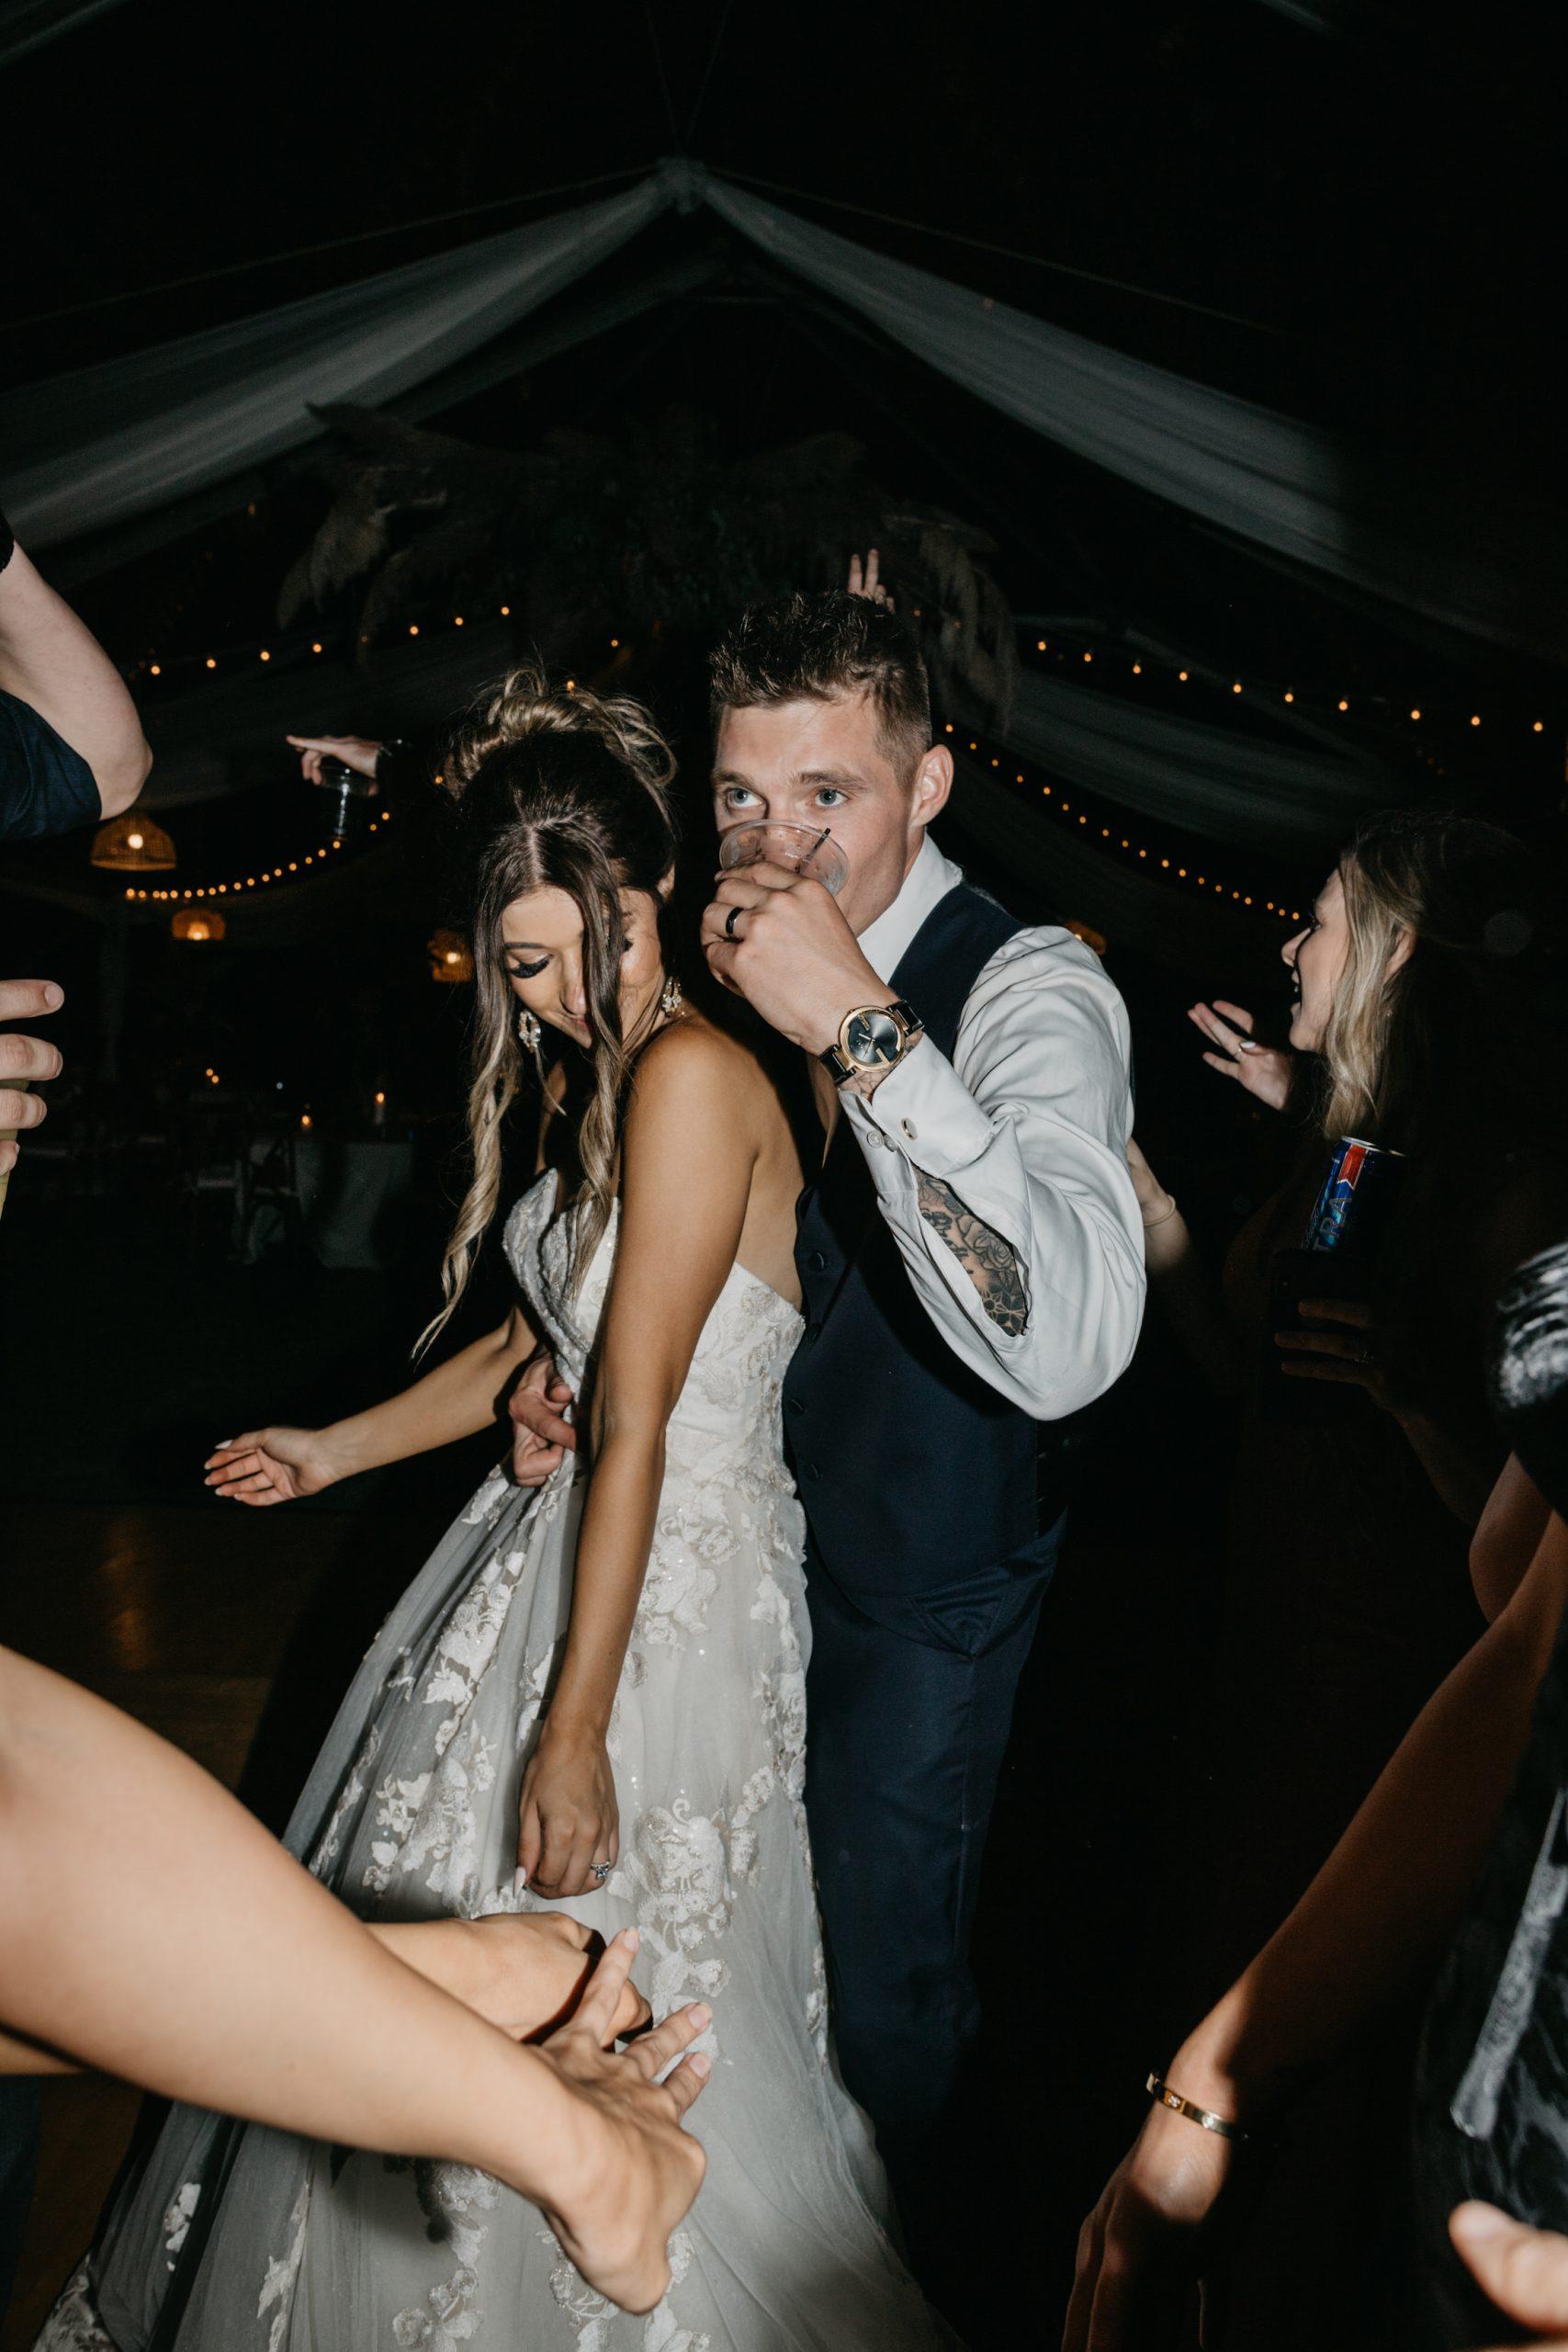 Bride and groom dance on the dance floor, image by Fatima Elreda Photo